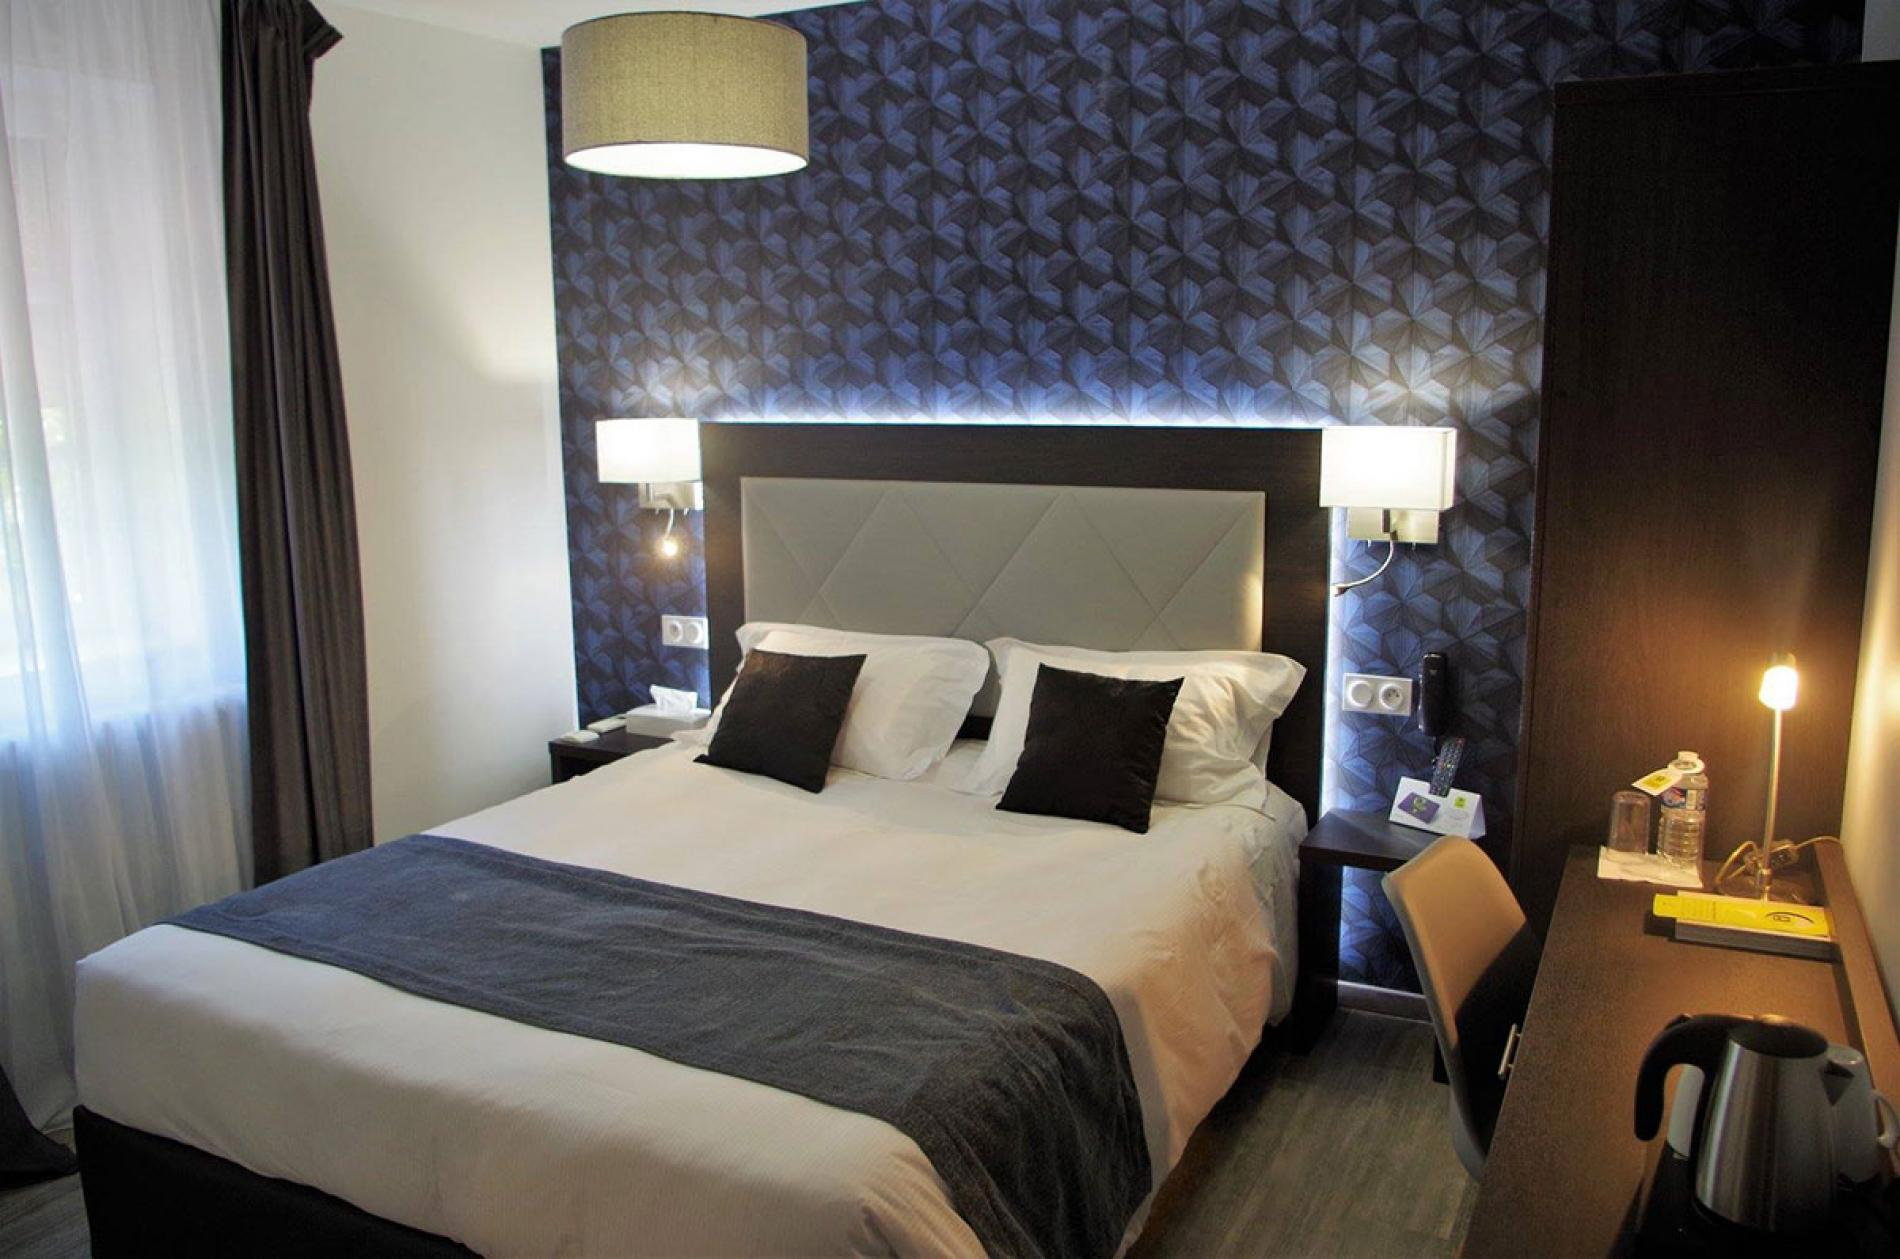 Chambre de l'hôtel Les Platanes